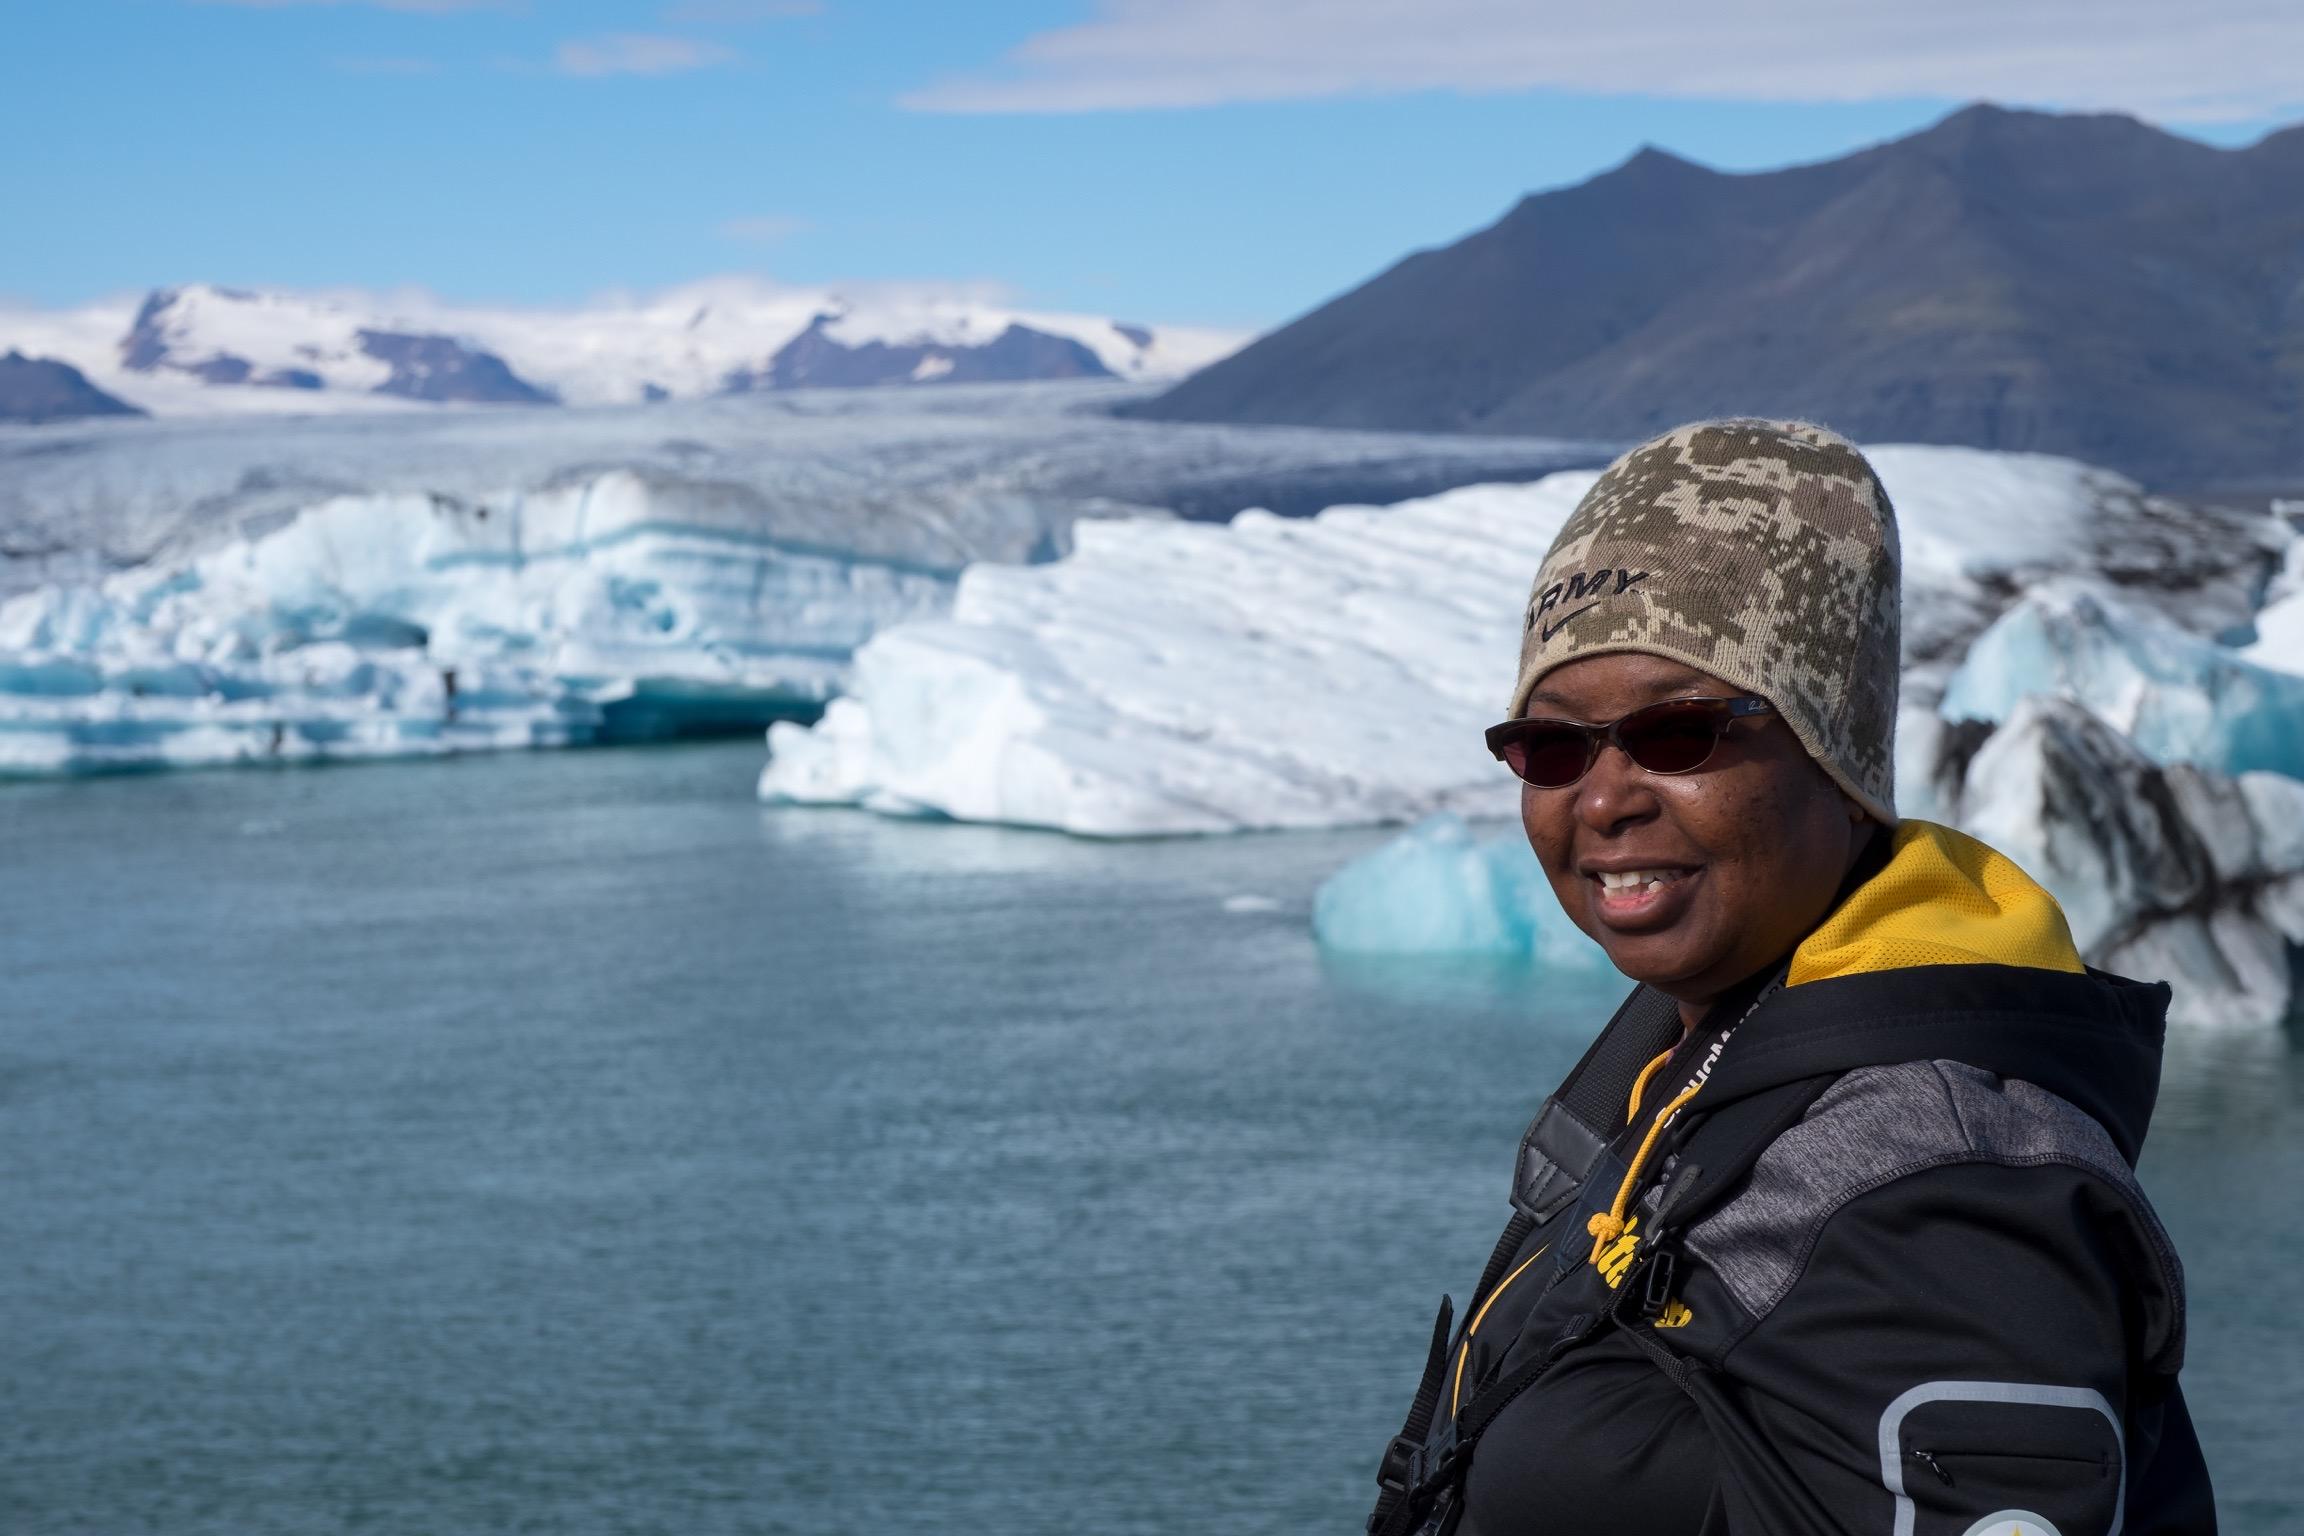 Danielle Lewis, owner of SelfishMe Travel LLC, at Glacier Lagoon (Jokulsarlon), Iceland